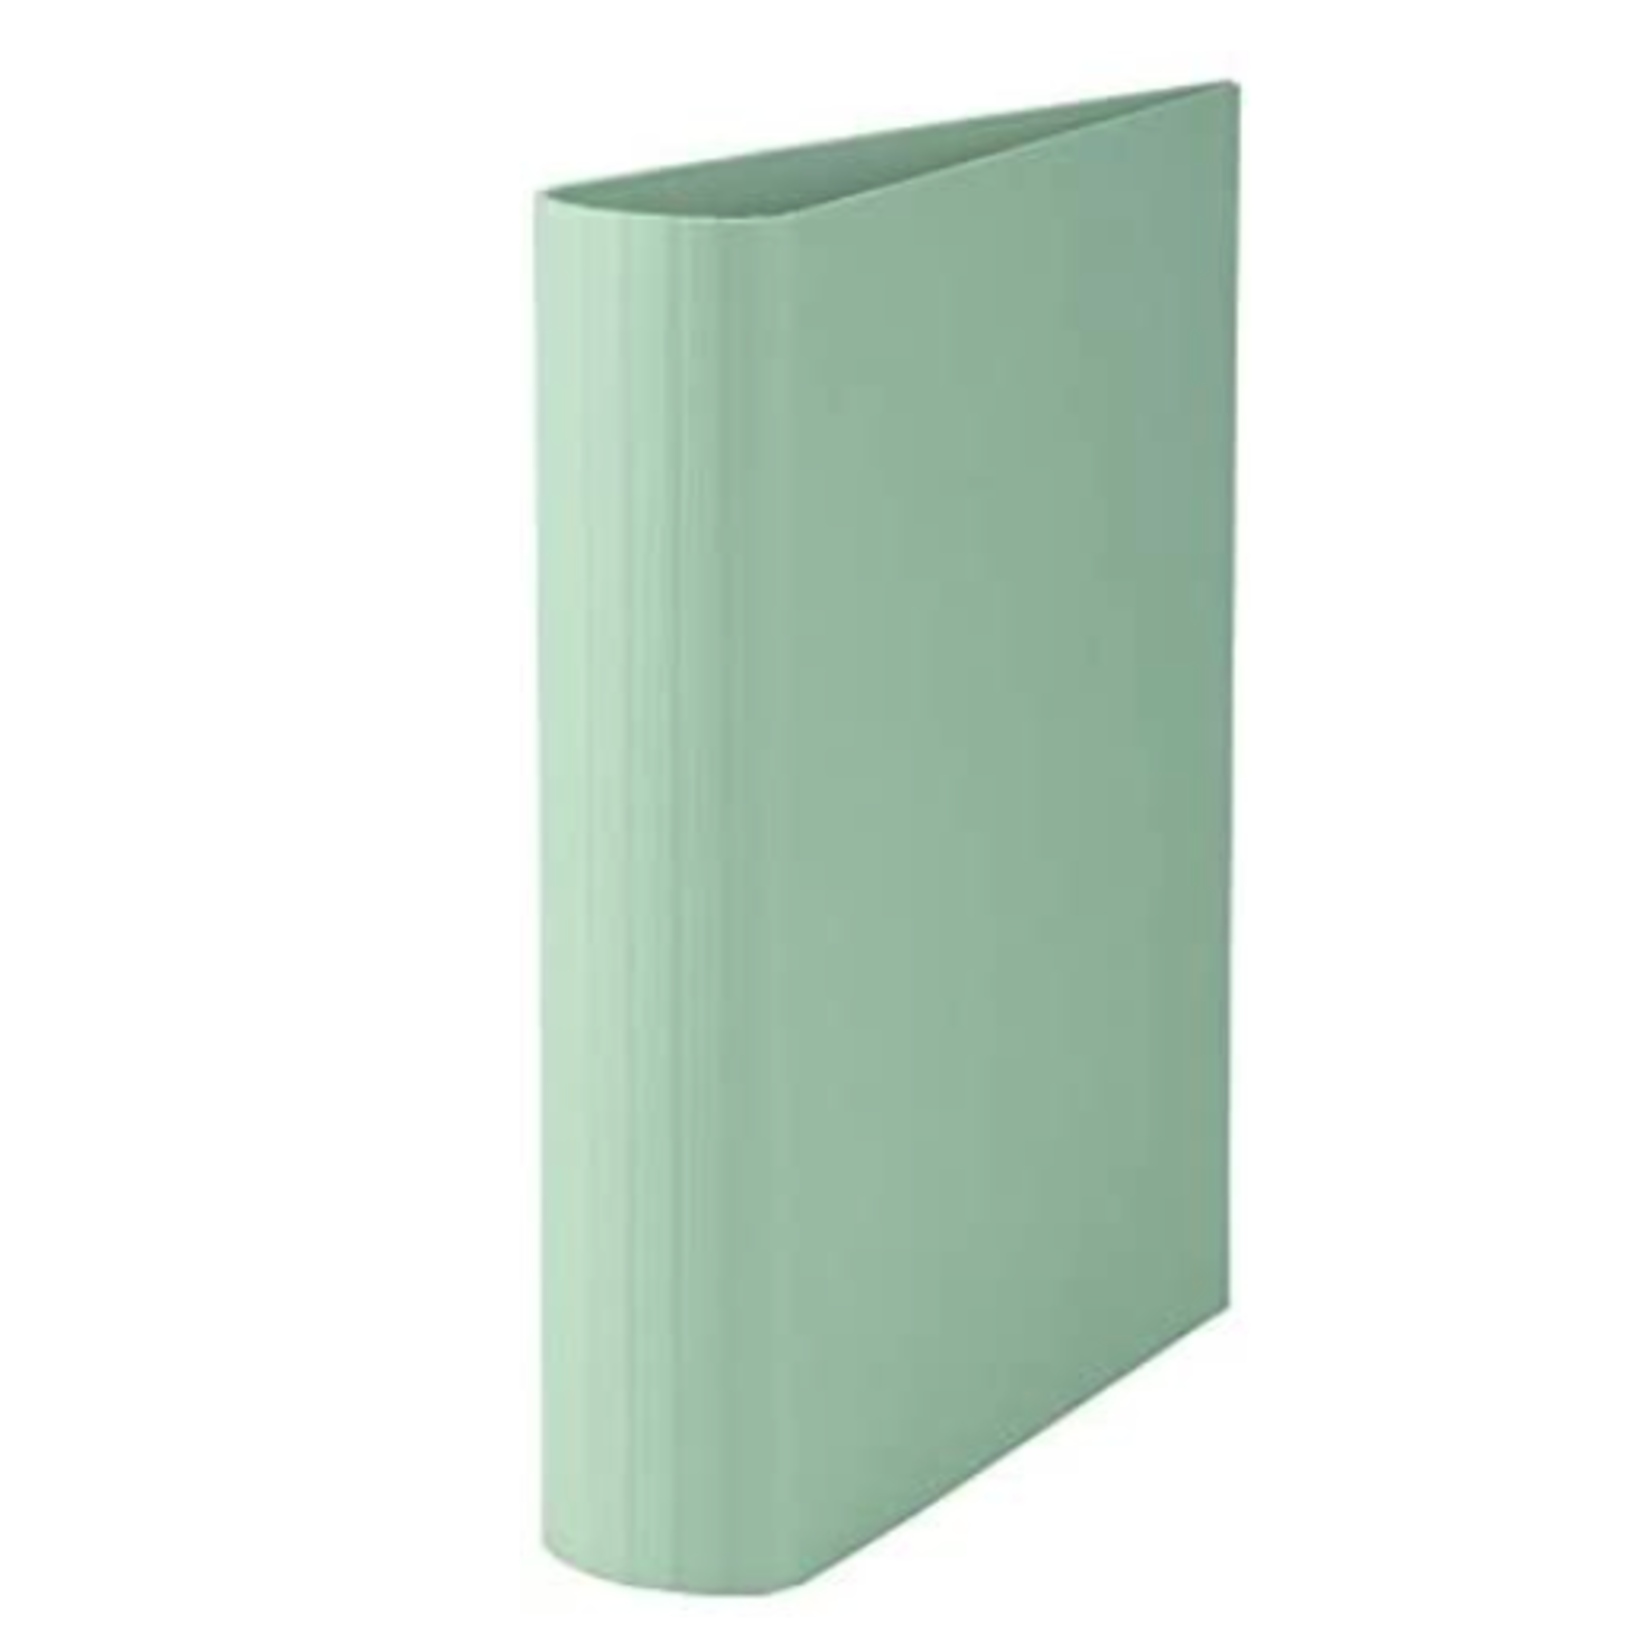 Rössler SOHO Ringbuch A4/4R 5cm mint